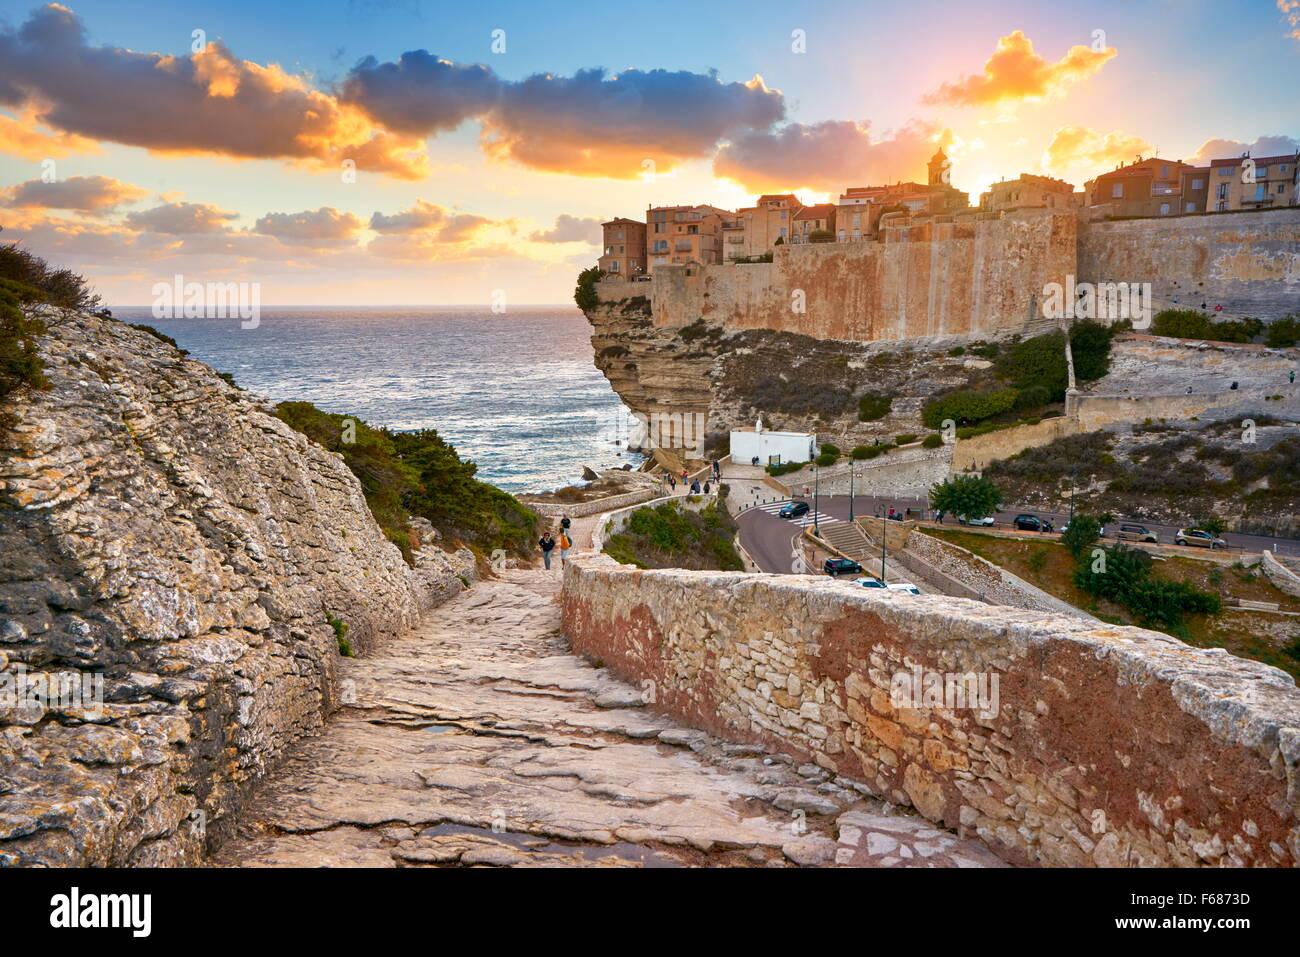 Korsika - Bonifacio bei Sonnenuntergang, Frankreich Stockbild